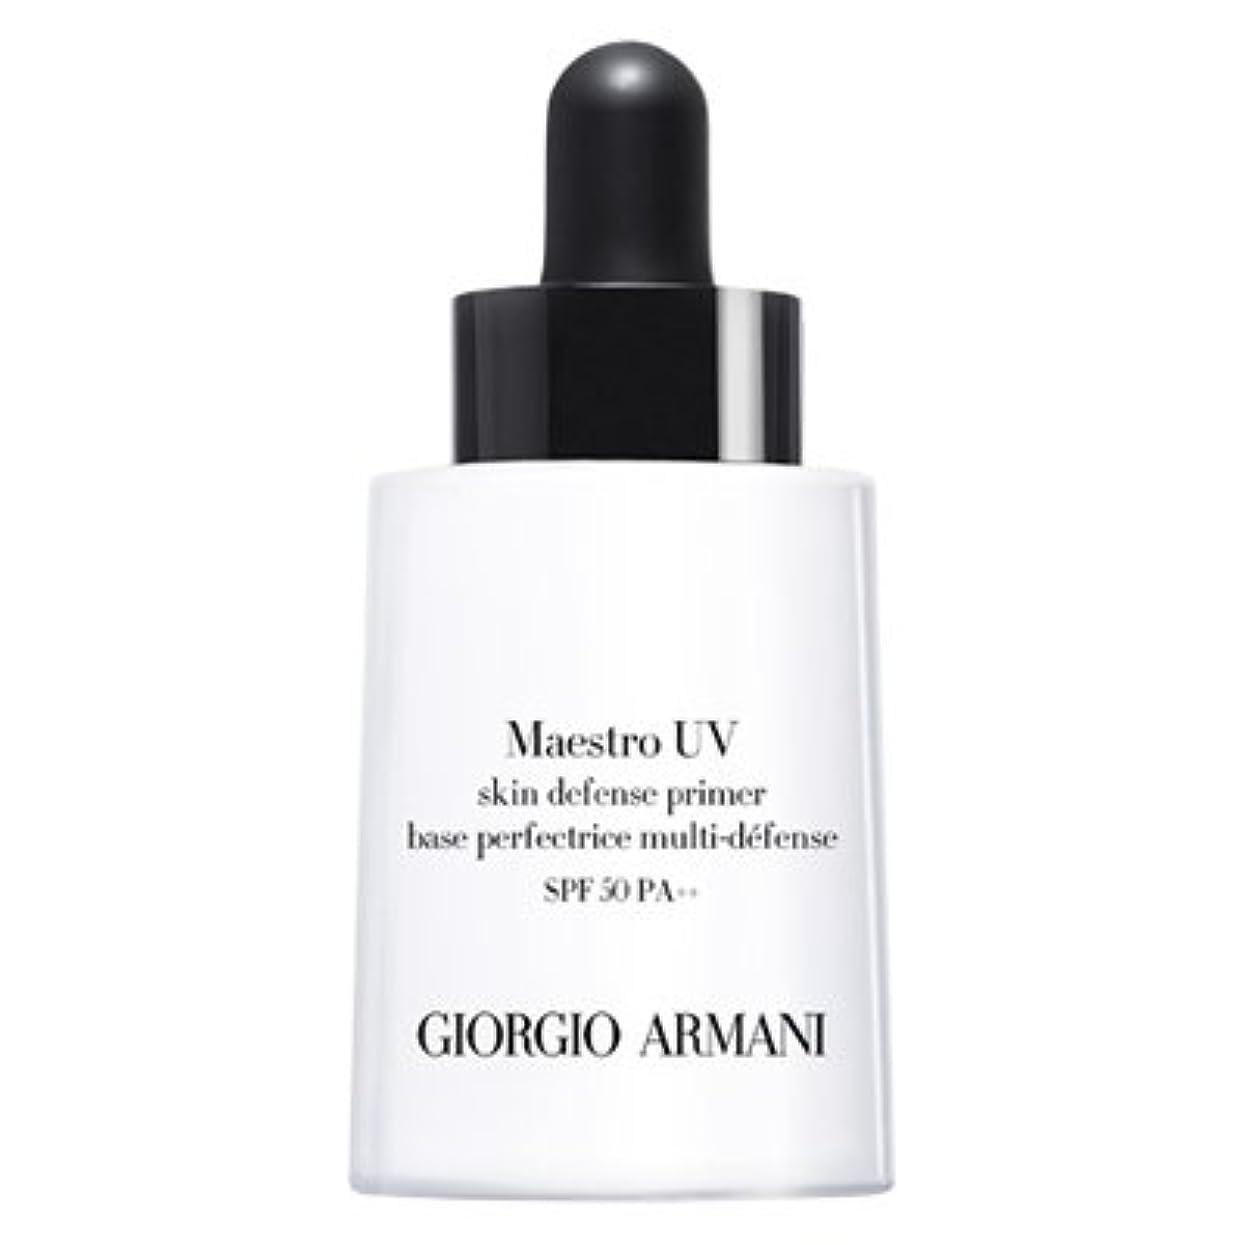 GIORGIO ARMANI ジョルジオ アルマーニ マエストロ UV SPF50 PA++ 30ml [並行輸入品]